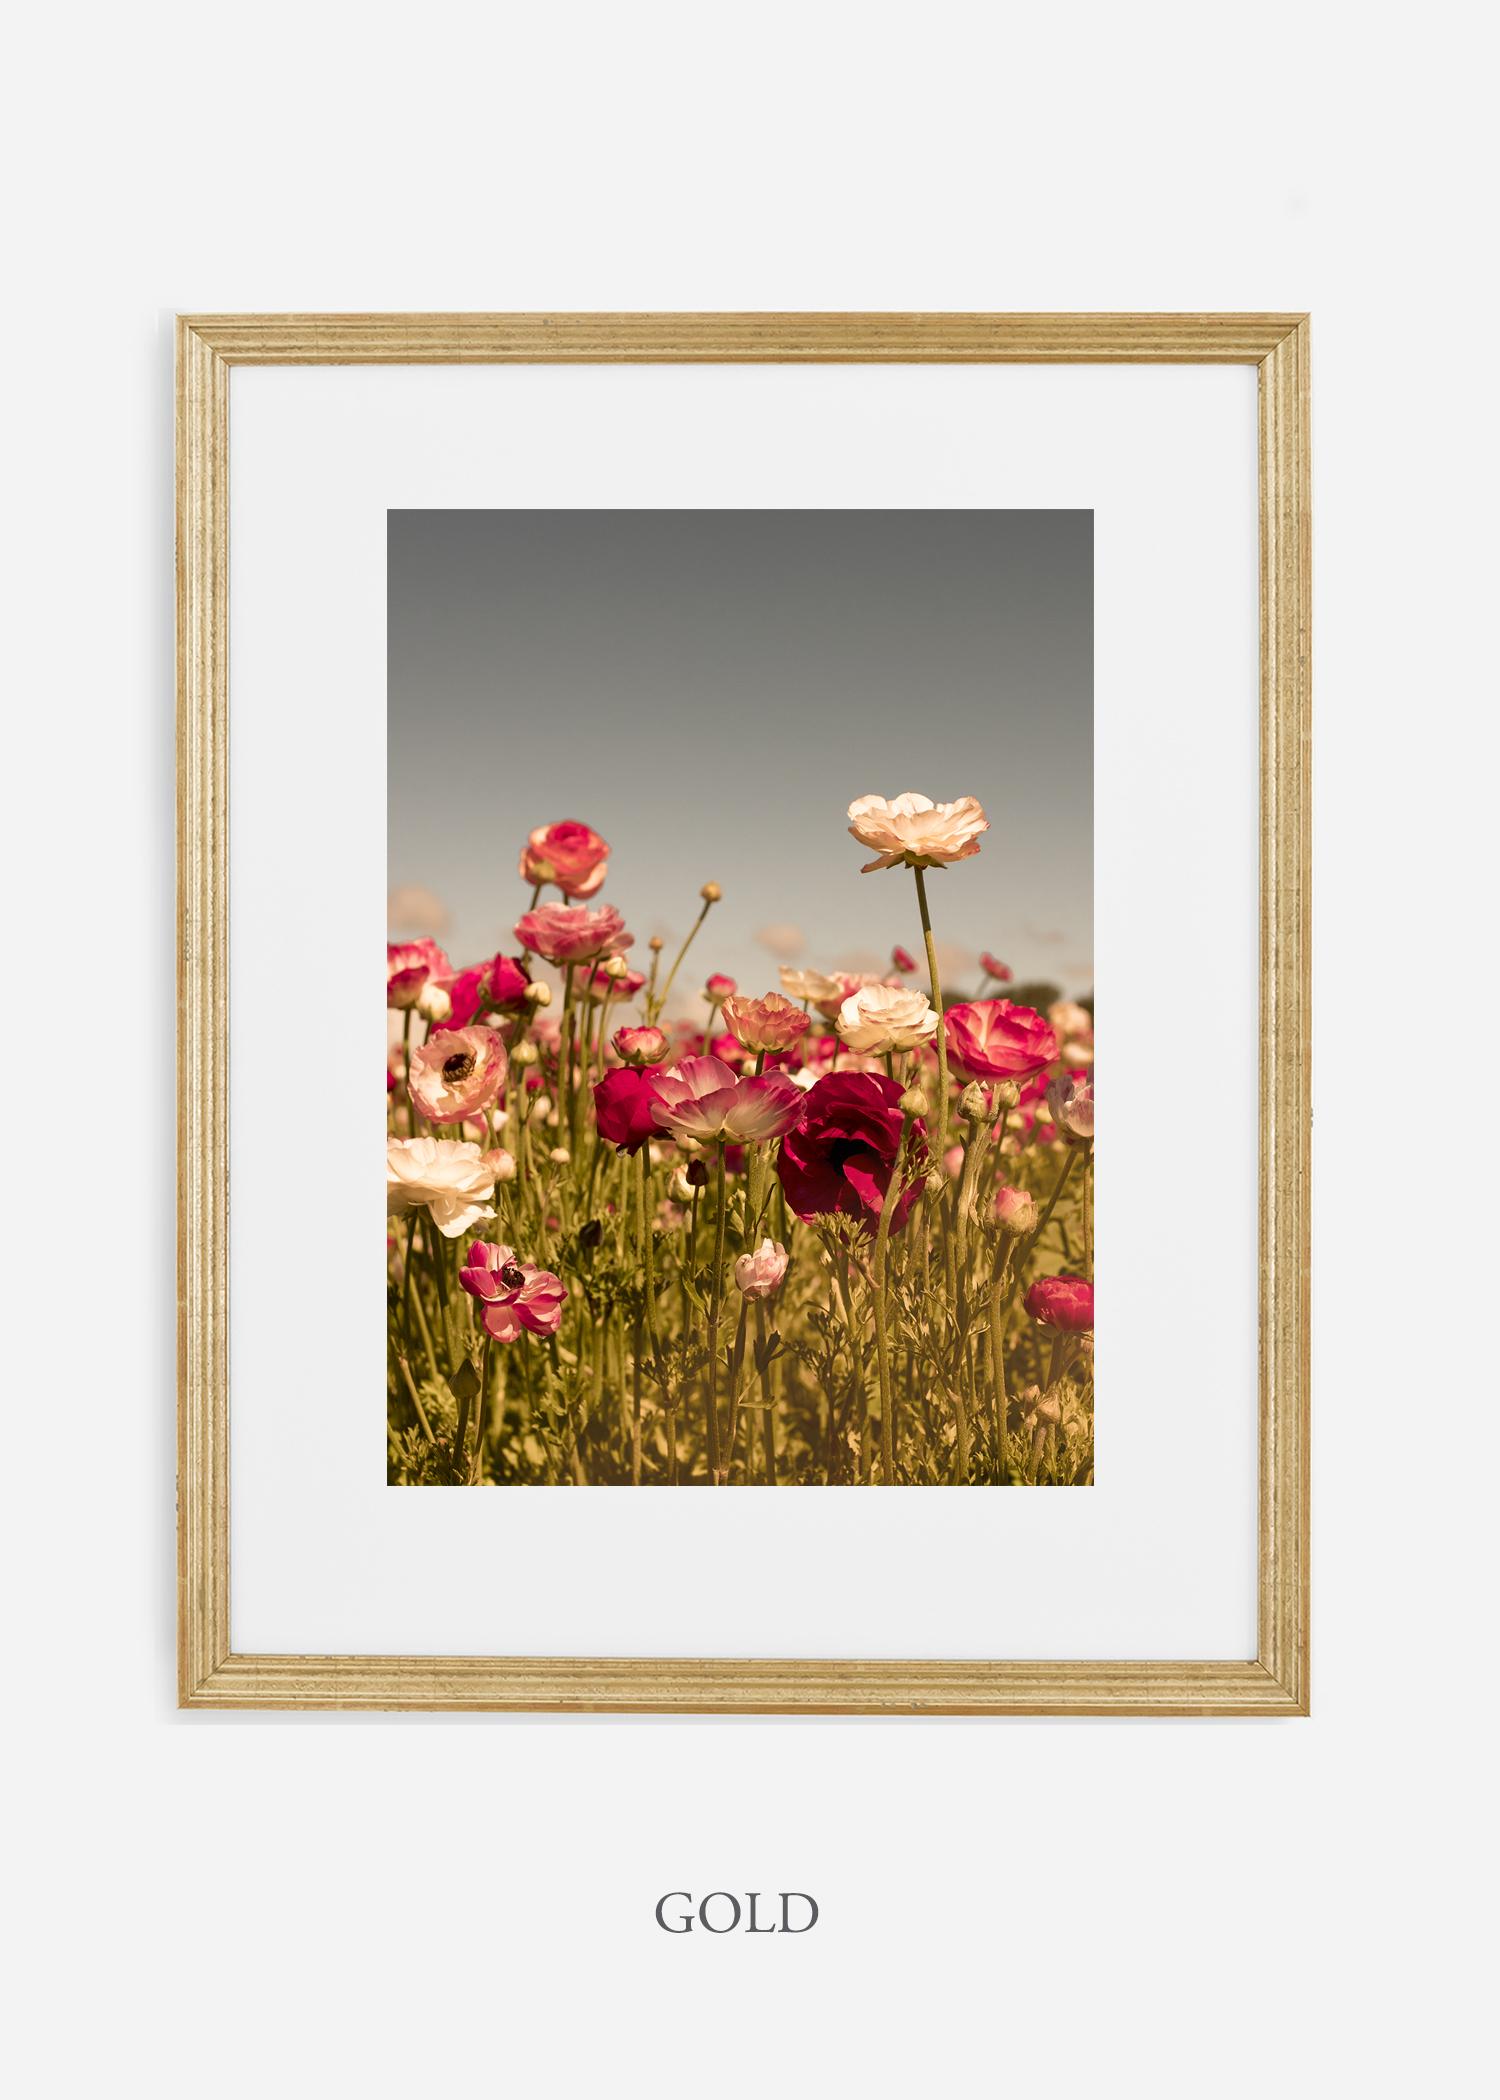 wilder-california-Floral-No.3-gold-frame-mat-interior-design-botanical-print-art-floral-art.jpg